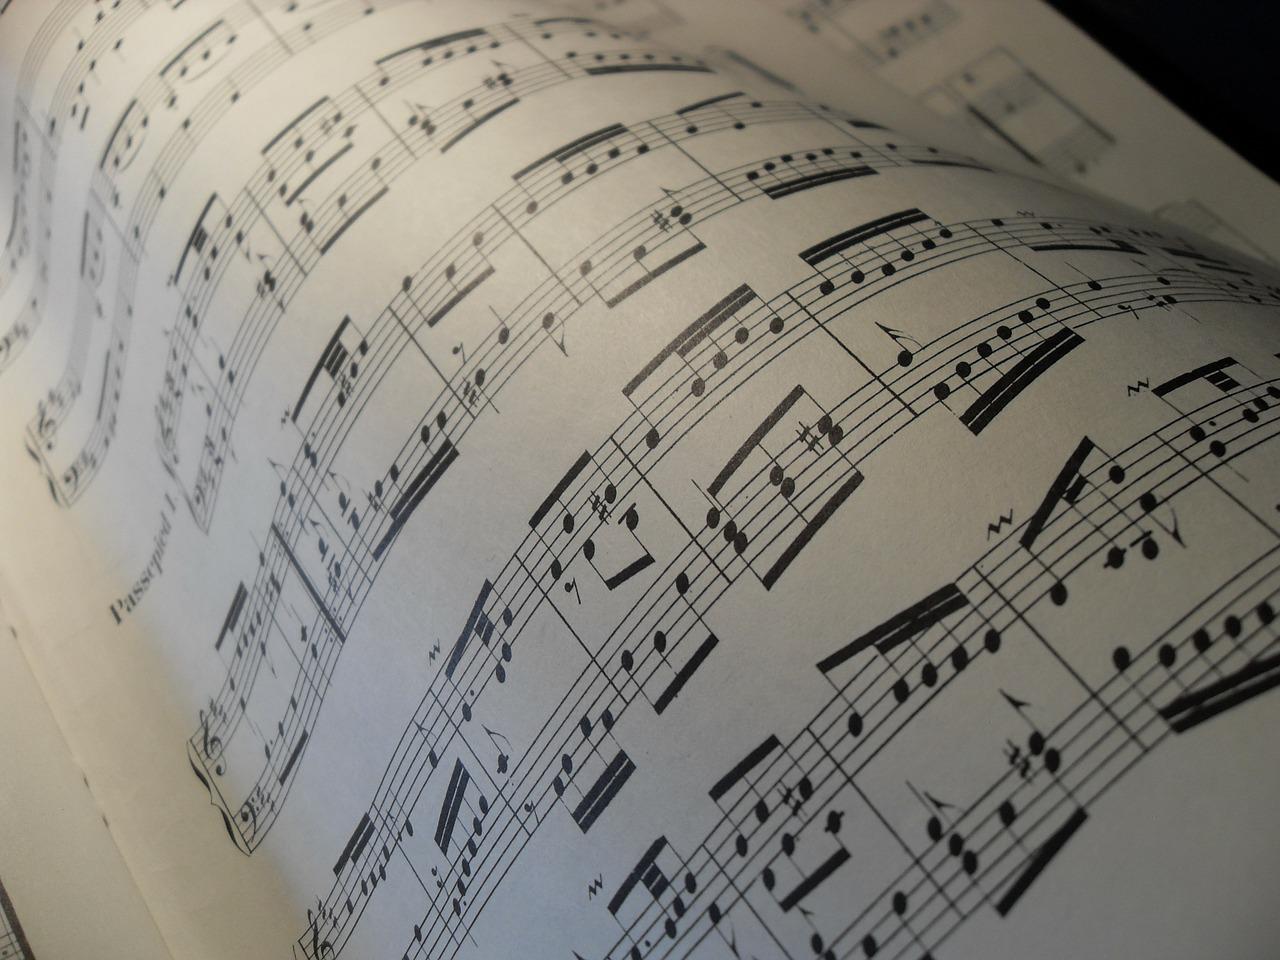 music-277278_1280.jpg